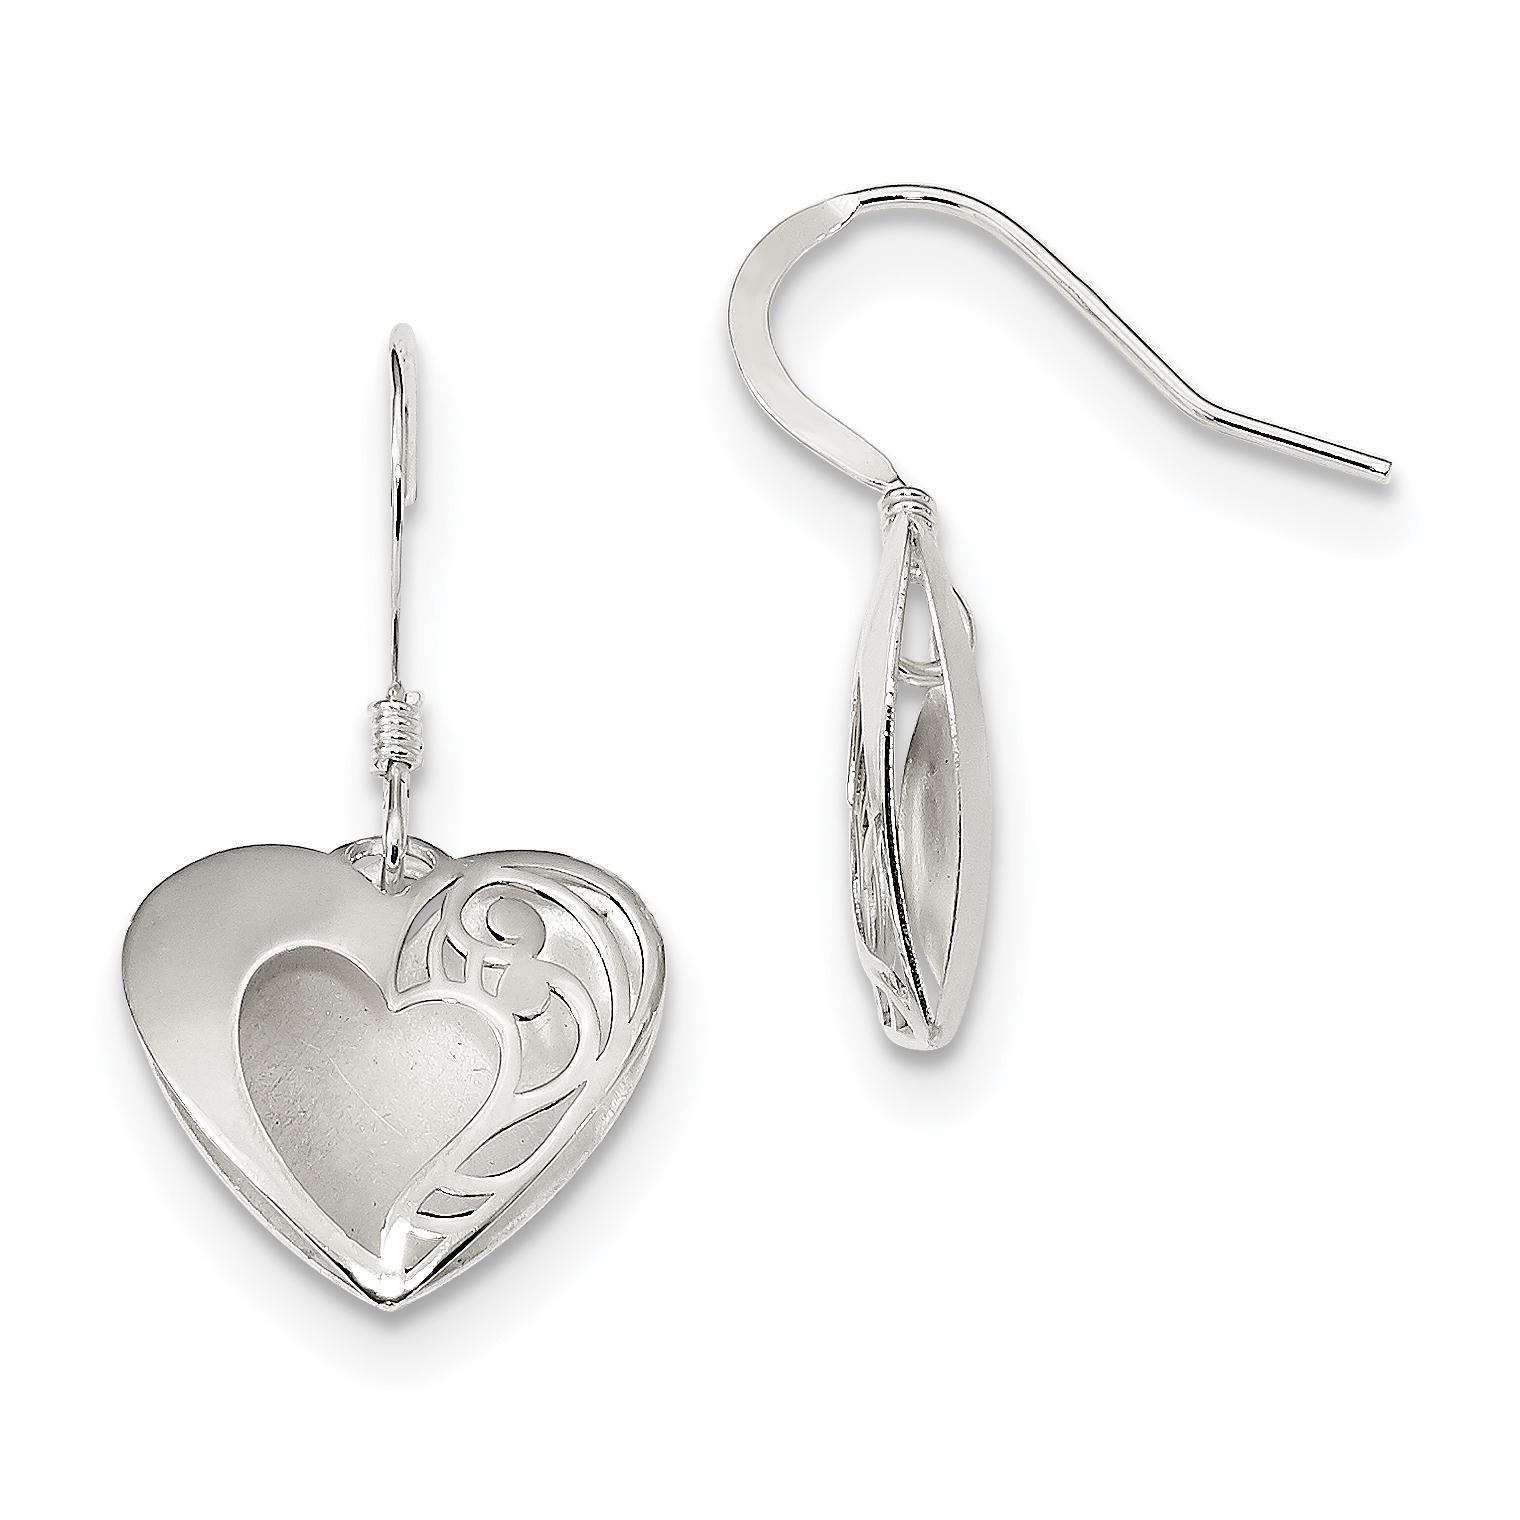 925 Sterling Silver Drop Dangle Chandelier Earrings Pendant Charm Necklace Set Love Fine Jewelry Gifts For Women For Her - image 1 de 4